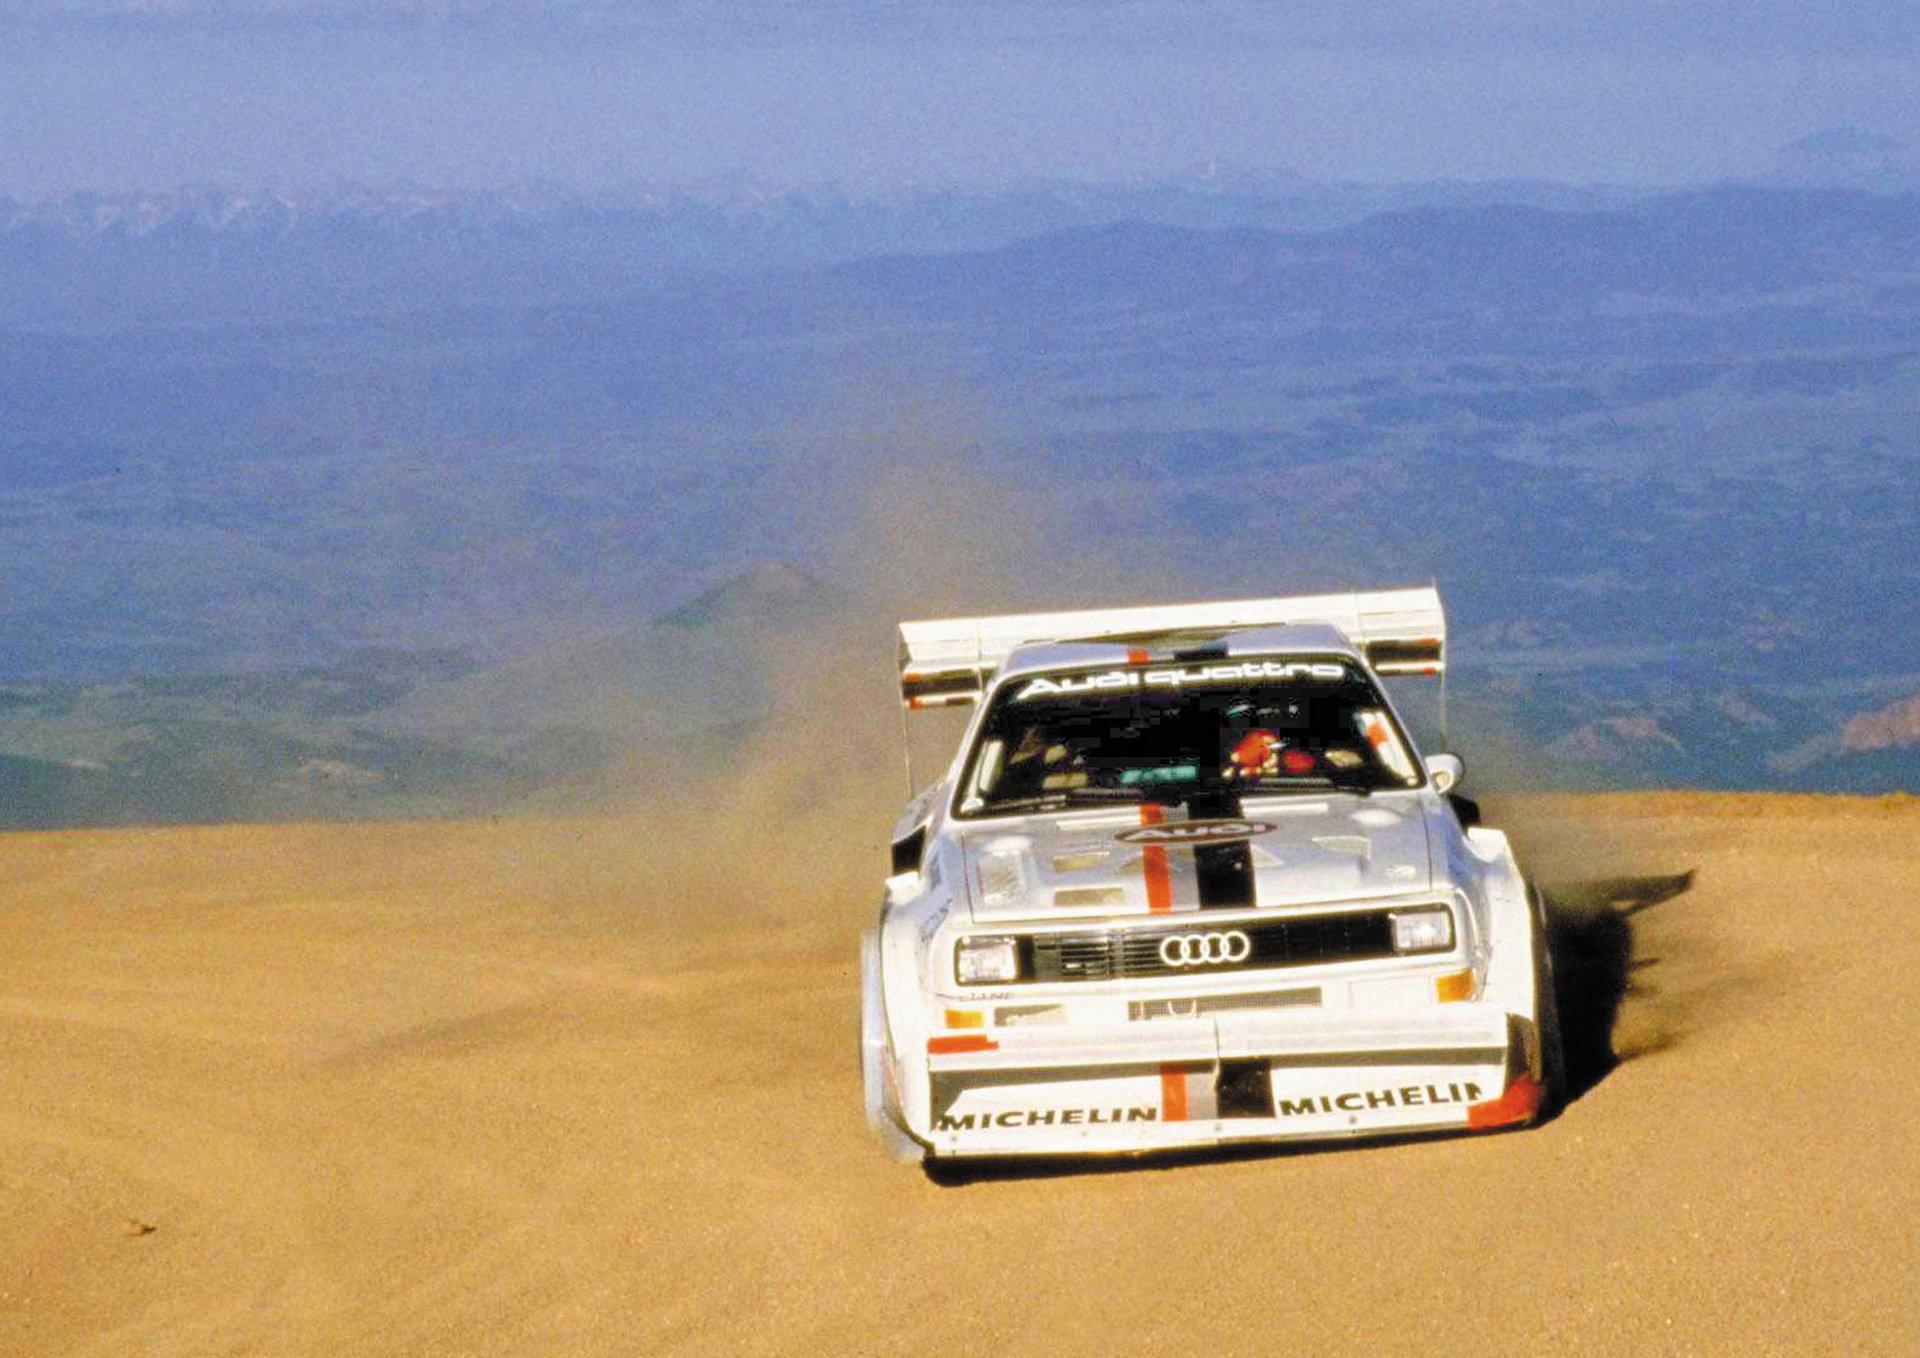 1985-Audi-Sport-Quattro-S1-E2-1.jpg